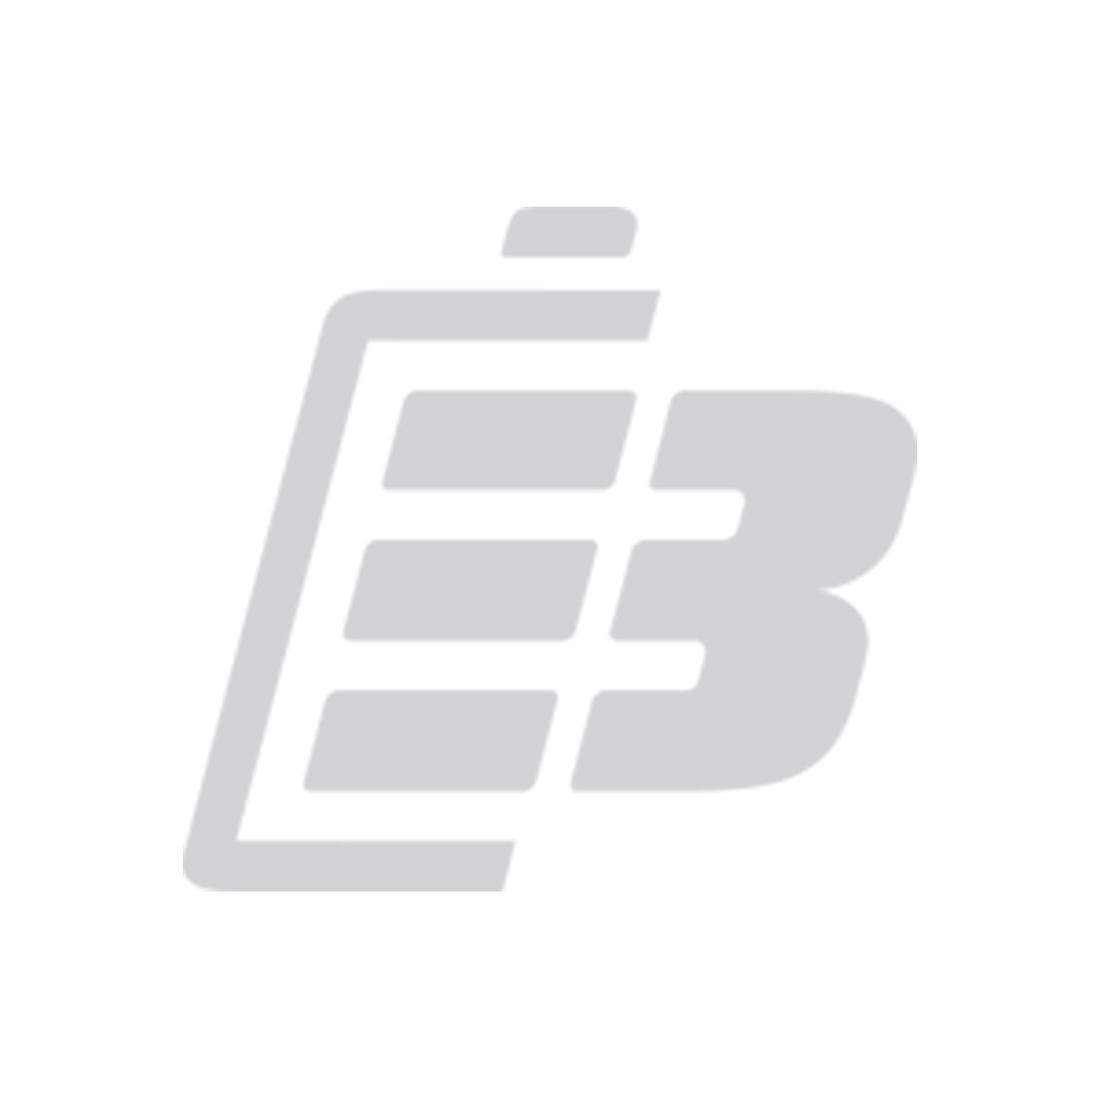 Wireless mouse battery Logitech G7 Laser_1